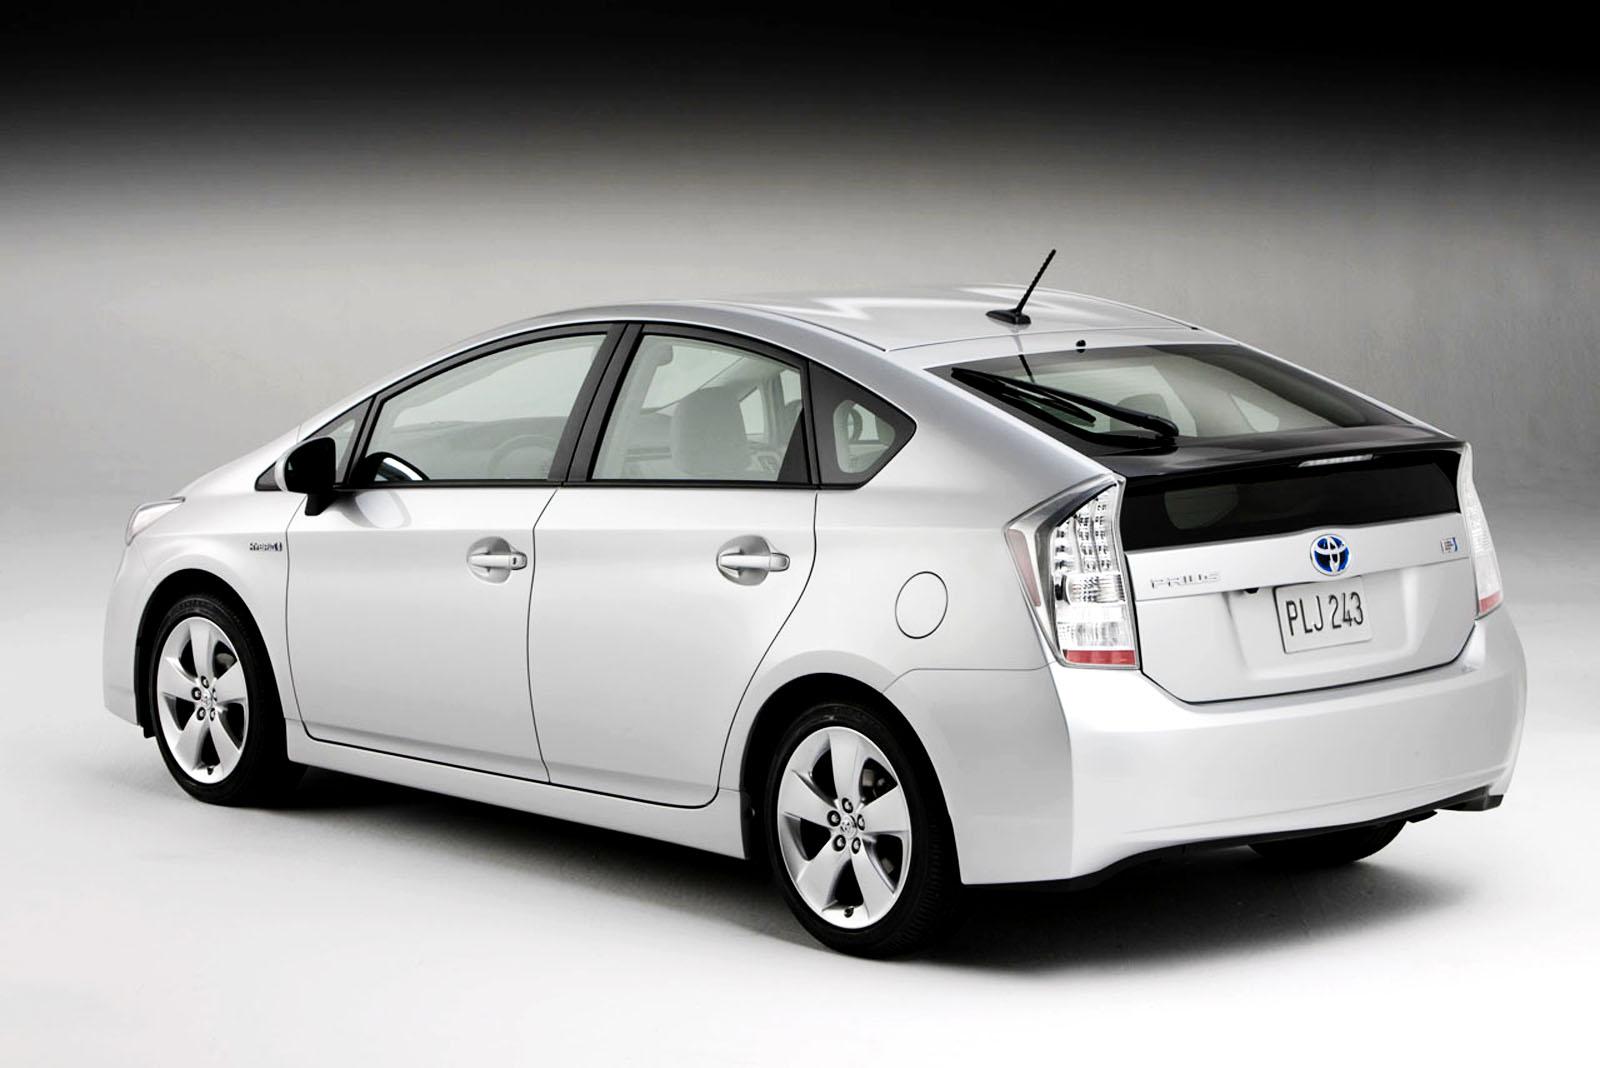 Toyota Prius Hybrit Car HD Wallpapers